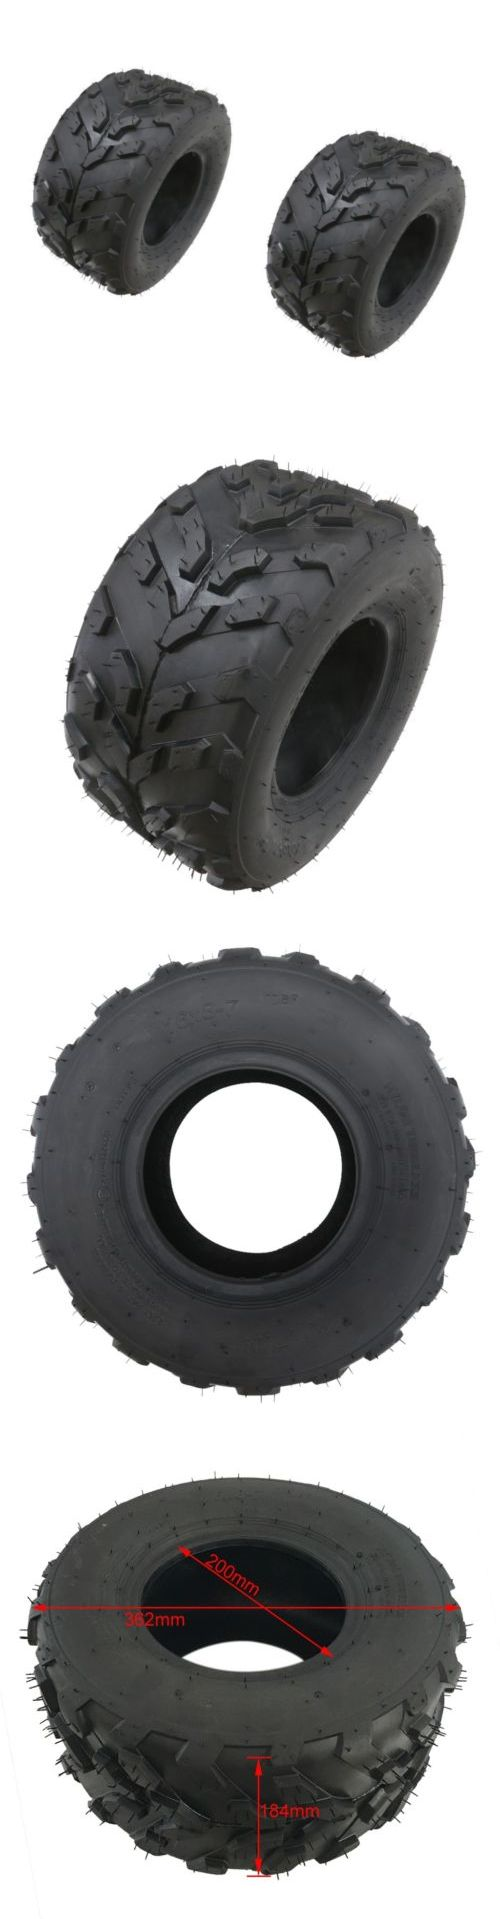 Training Wheels 177839: 2Pcs New 16X8-7 Tire Tyre 50 90Cc 110Cc 125Cc Honda Yamaha Suzuki Chinese Atvs -> BUY IT NOW ONLY: $79.99 on eBay!